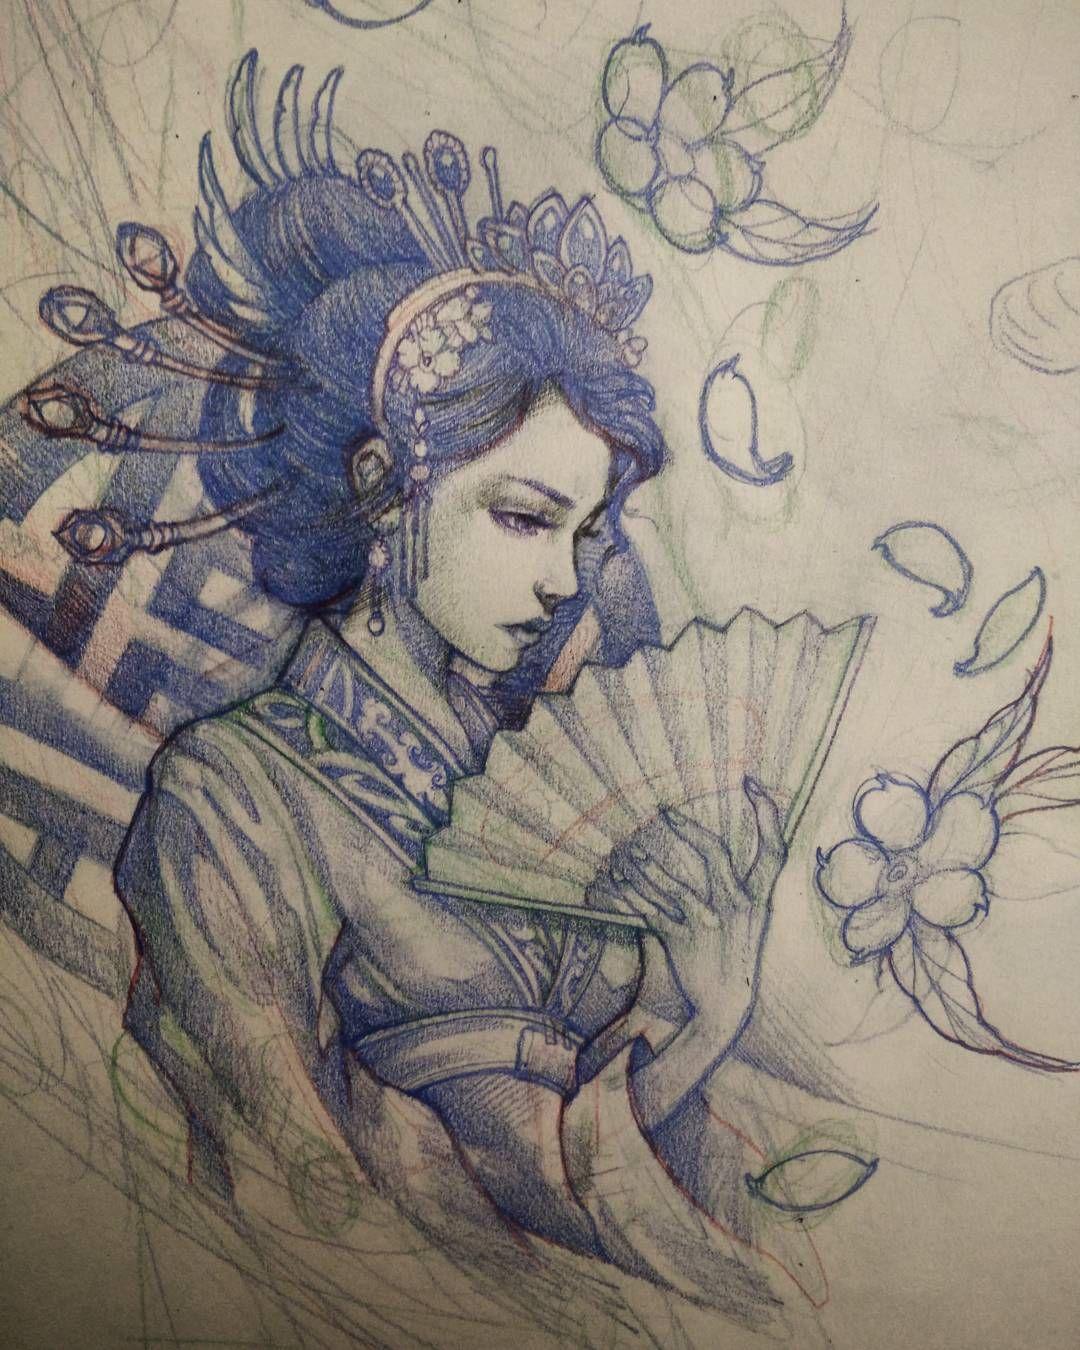 Geisha Sketch For Thursday Geisha Asianink Tattoo Irezumi Irezumicollective Asiantattoo Sketch Drawing Art Risunki Devushki Risunki Tatuirovki Gejsha